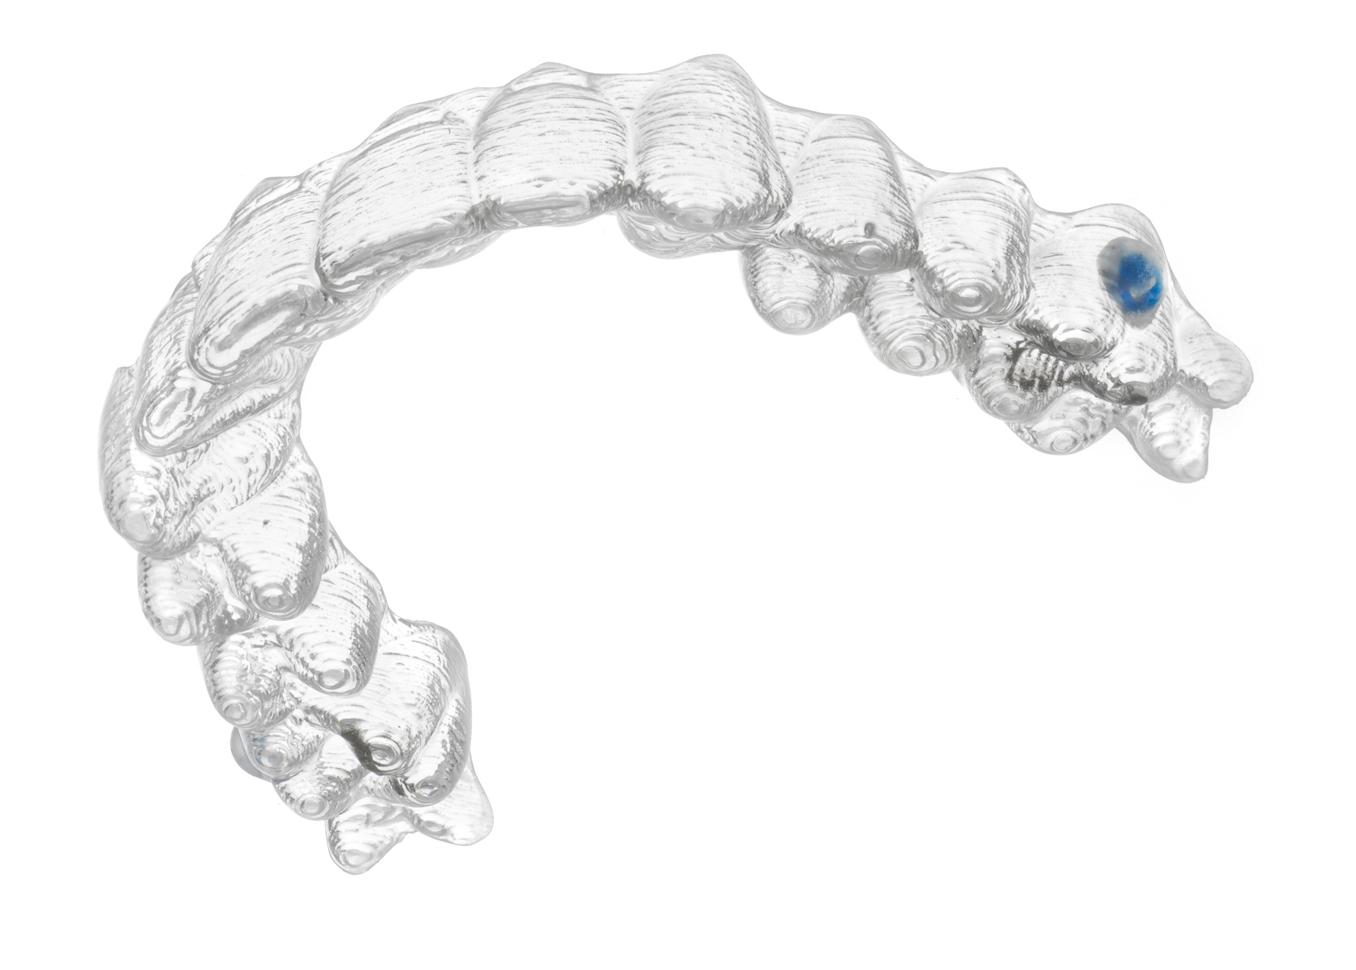 alineadores ortodoncia invisalign